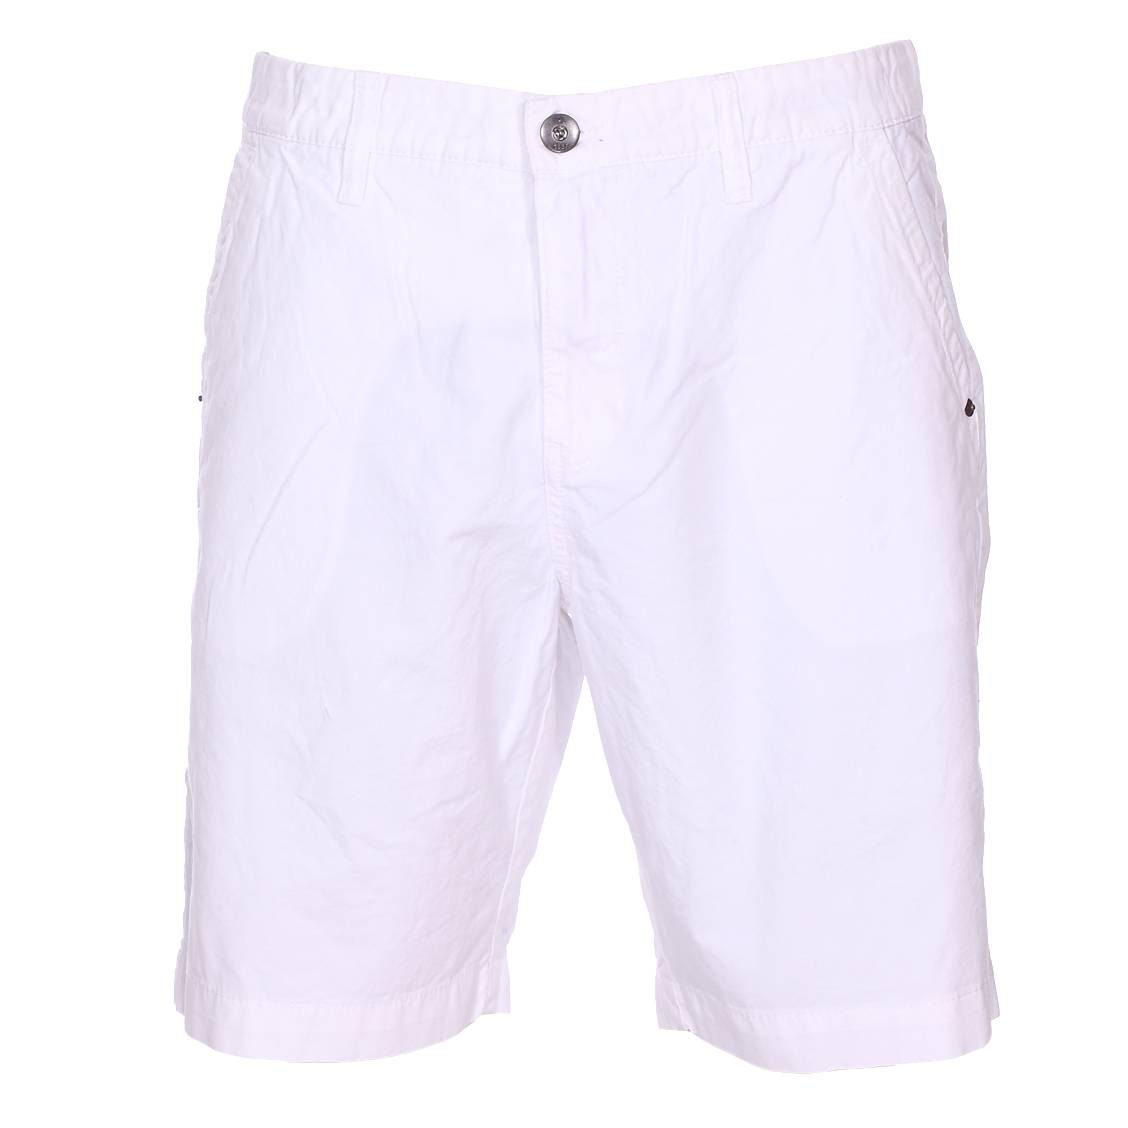 Short chino Gaastra en coton blanc